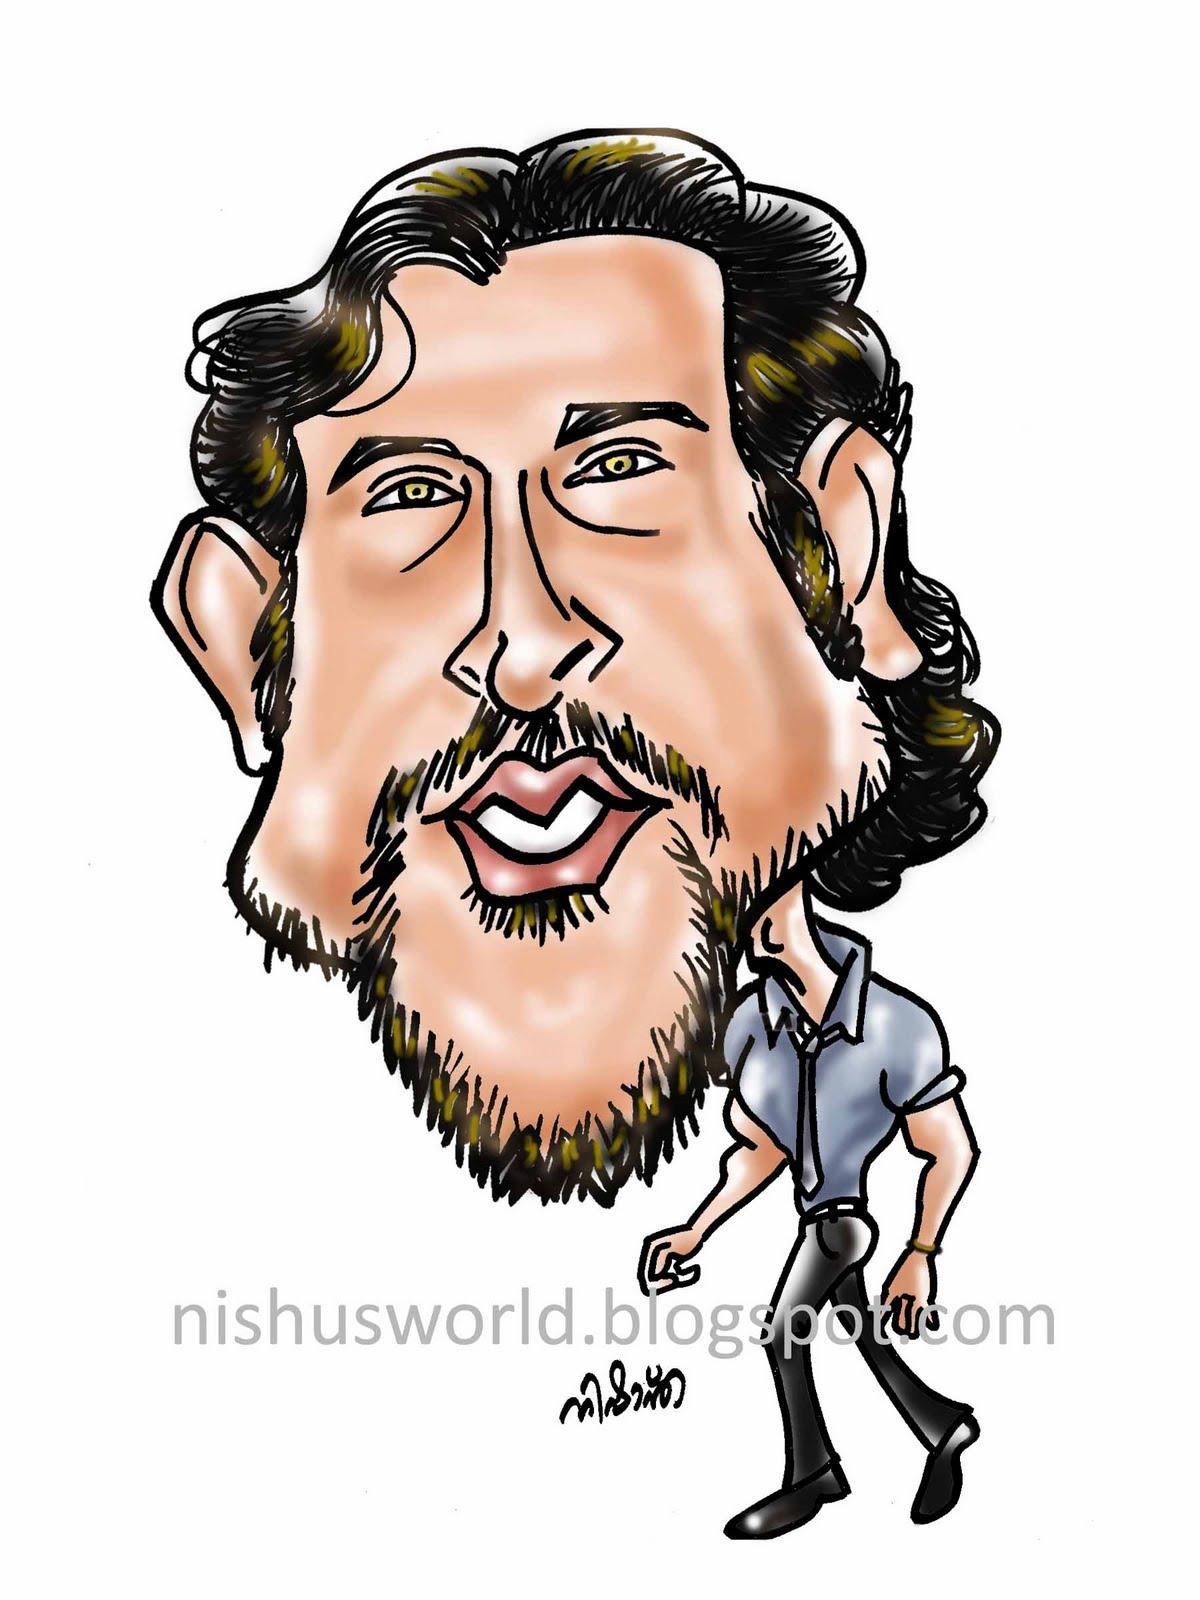 http://3.bp.blogspot.com/-0AFwp3ogblE/TmJoFKVCMTI/AAAAAAAABYg/TaRKBU_Clng/s1600/nishanth341a.jpg